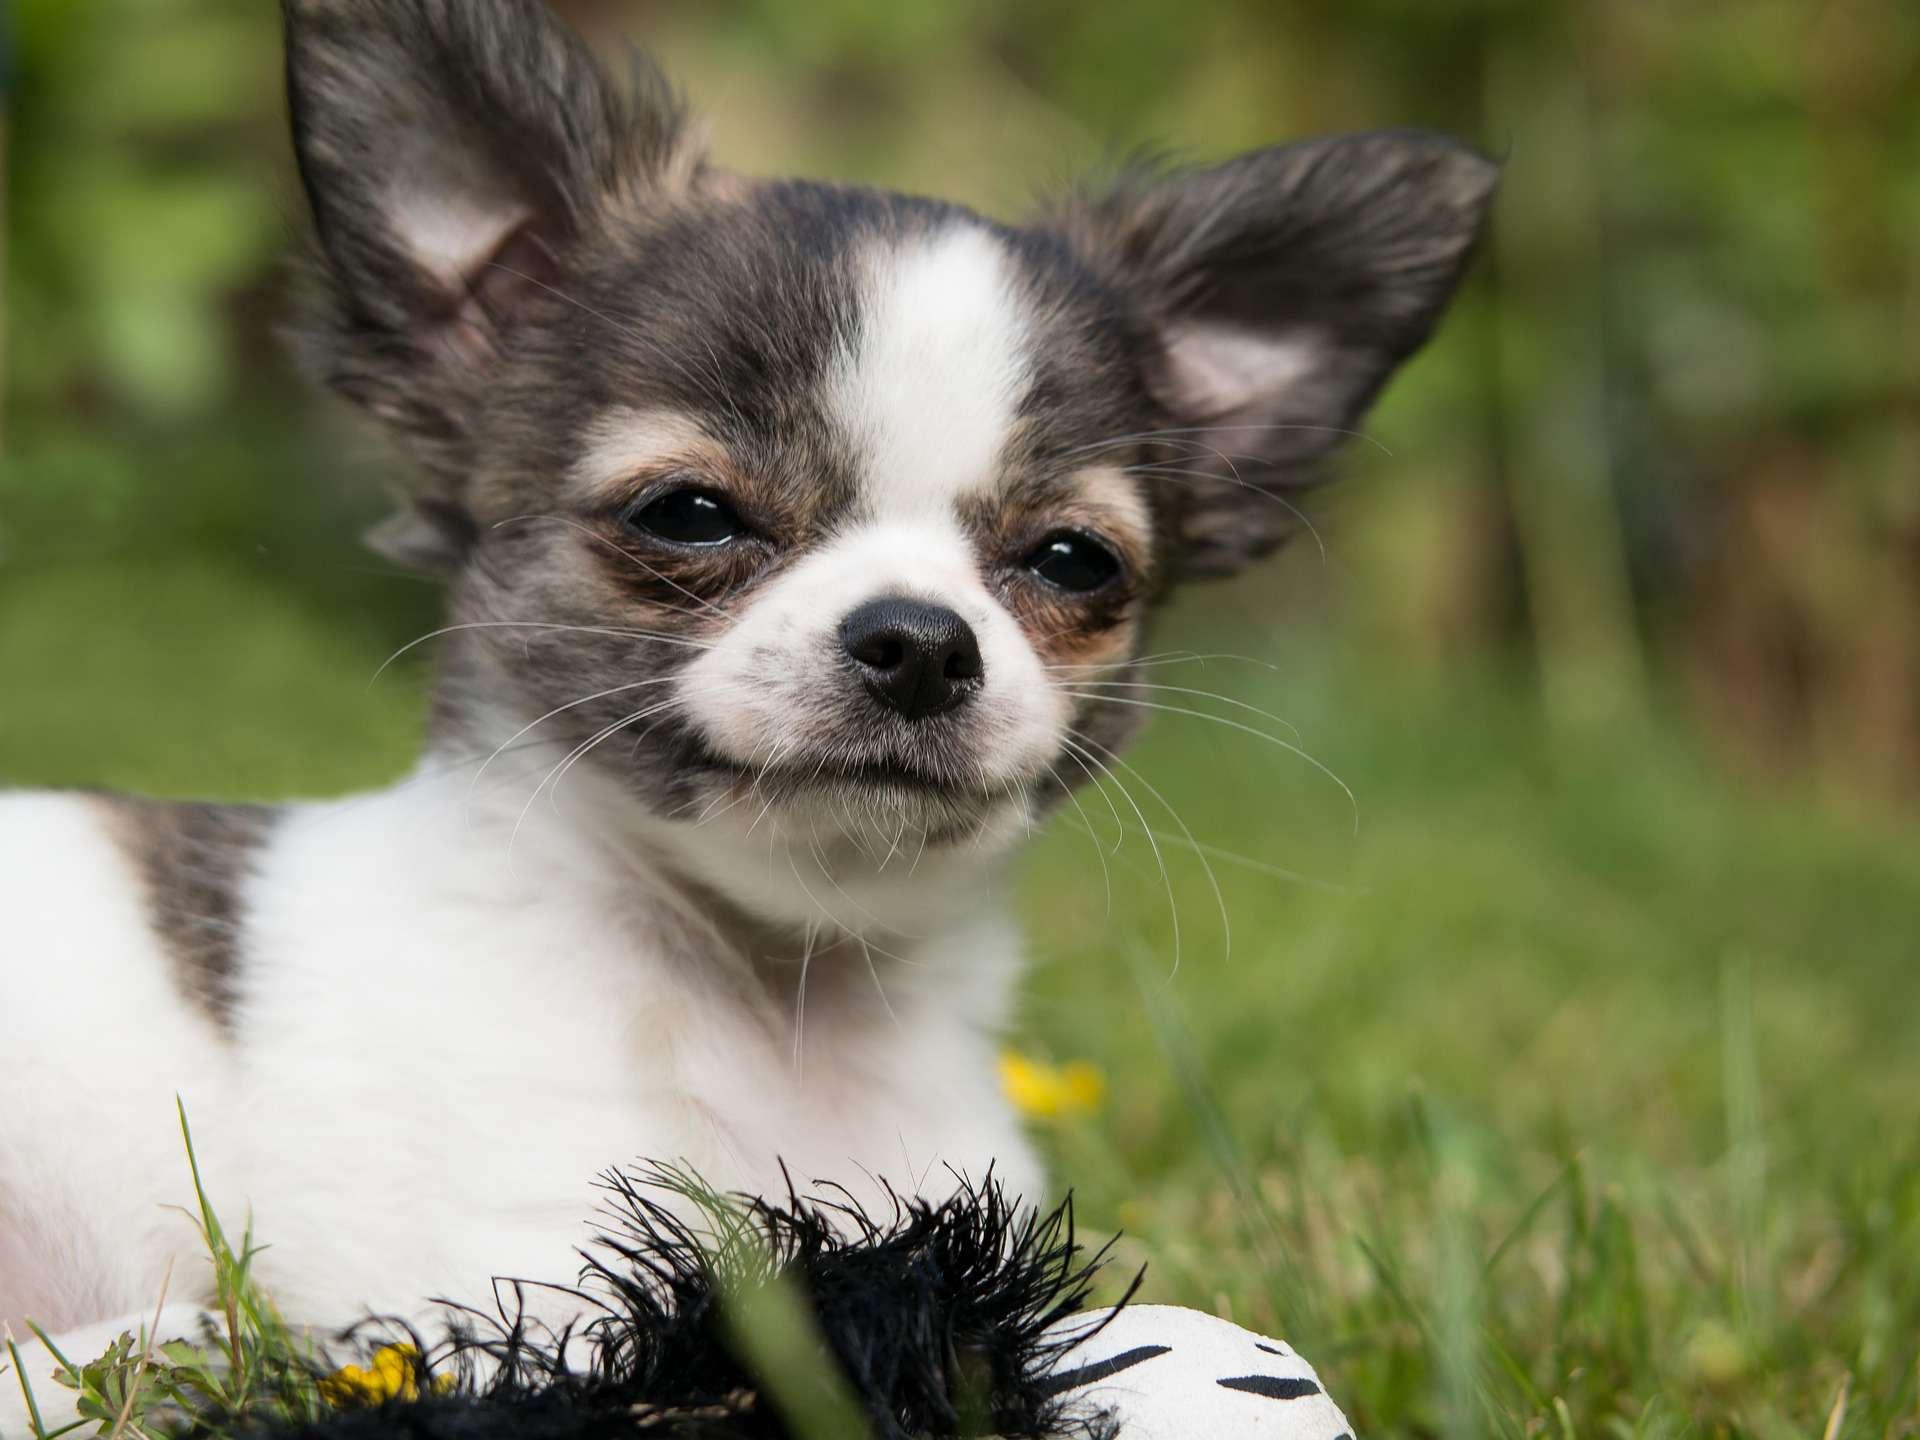 A chihuahua puppy sitting outside.